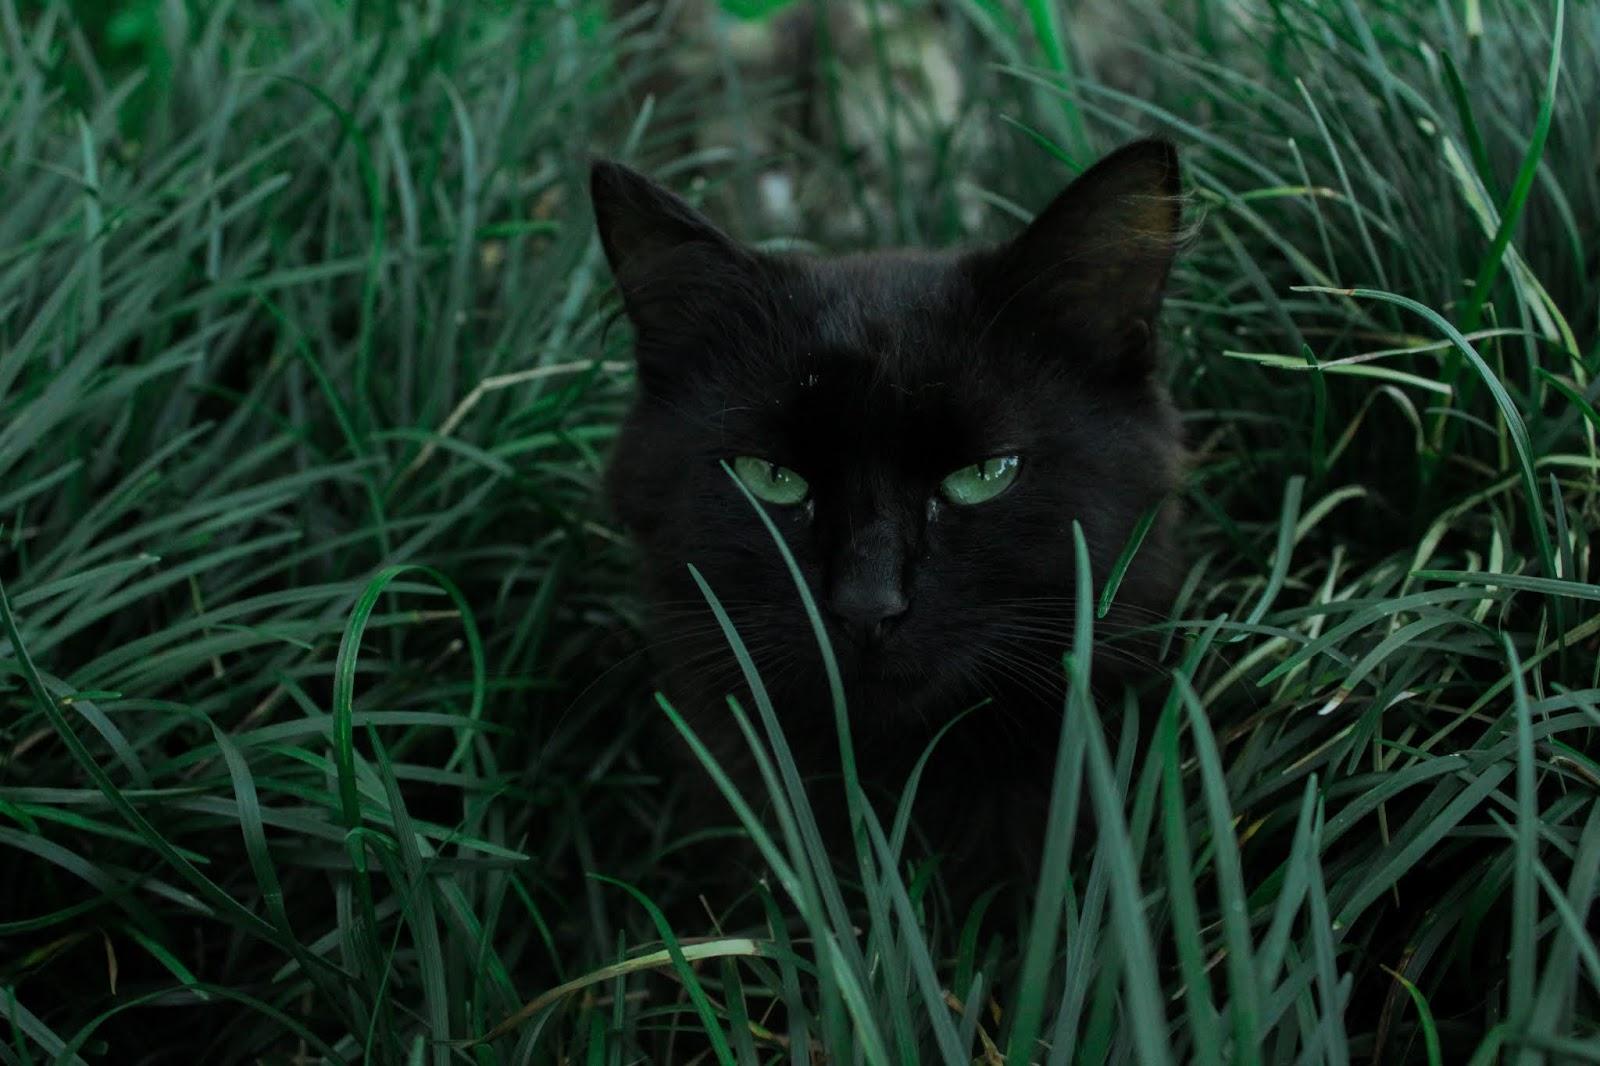 black cat hiding behind green grass,cat images